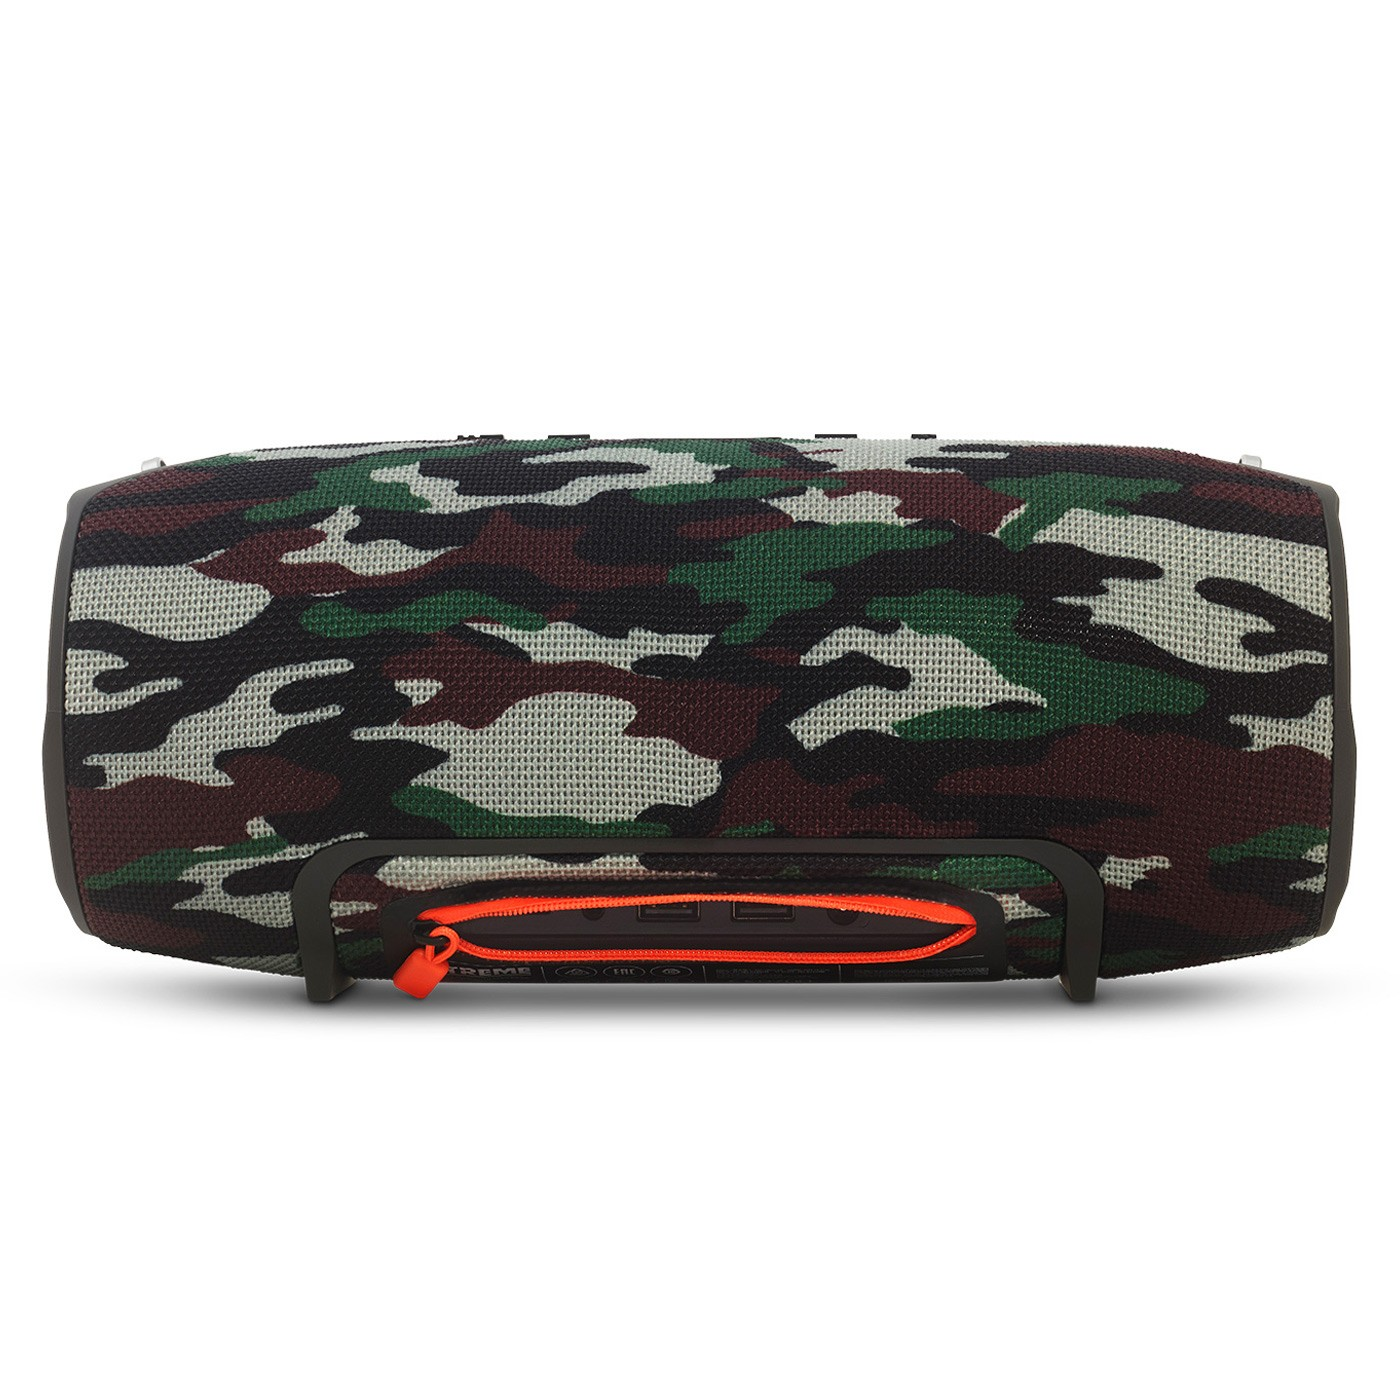 Jbl Xtreme Bluetooth Speaker Black Color Electronics Portable Red